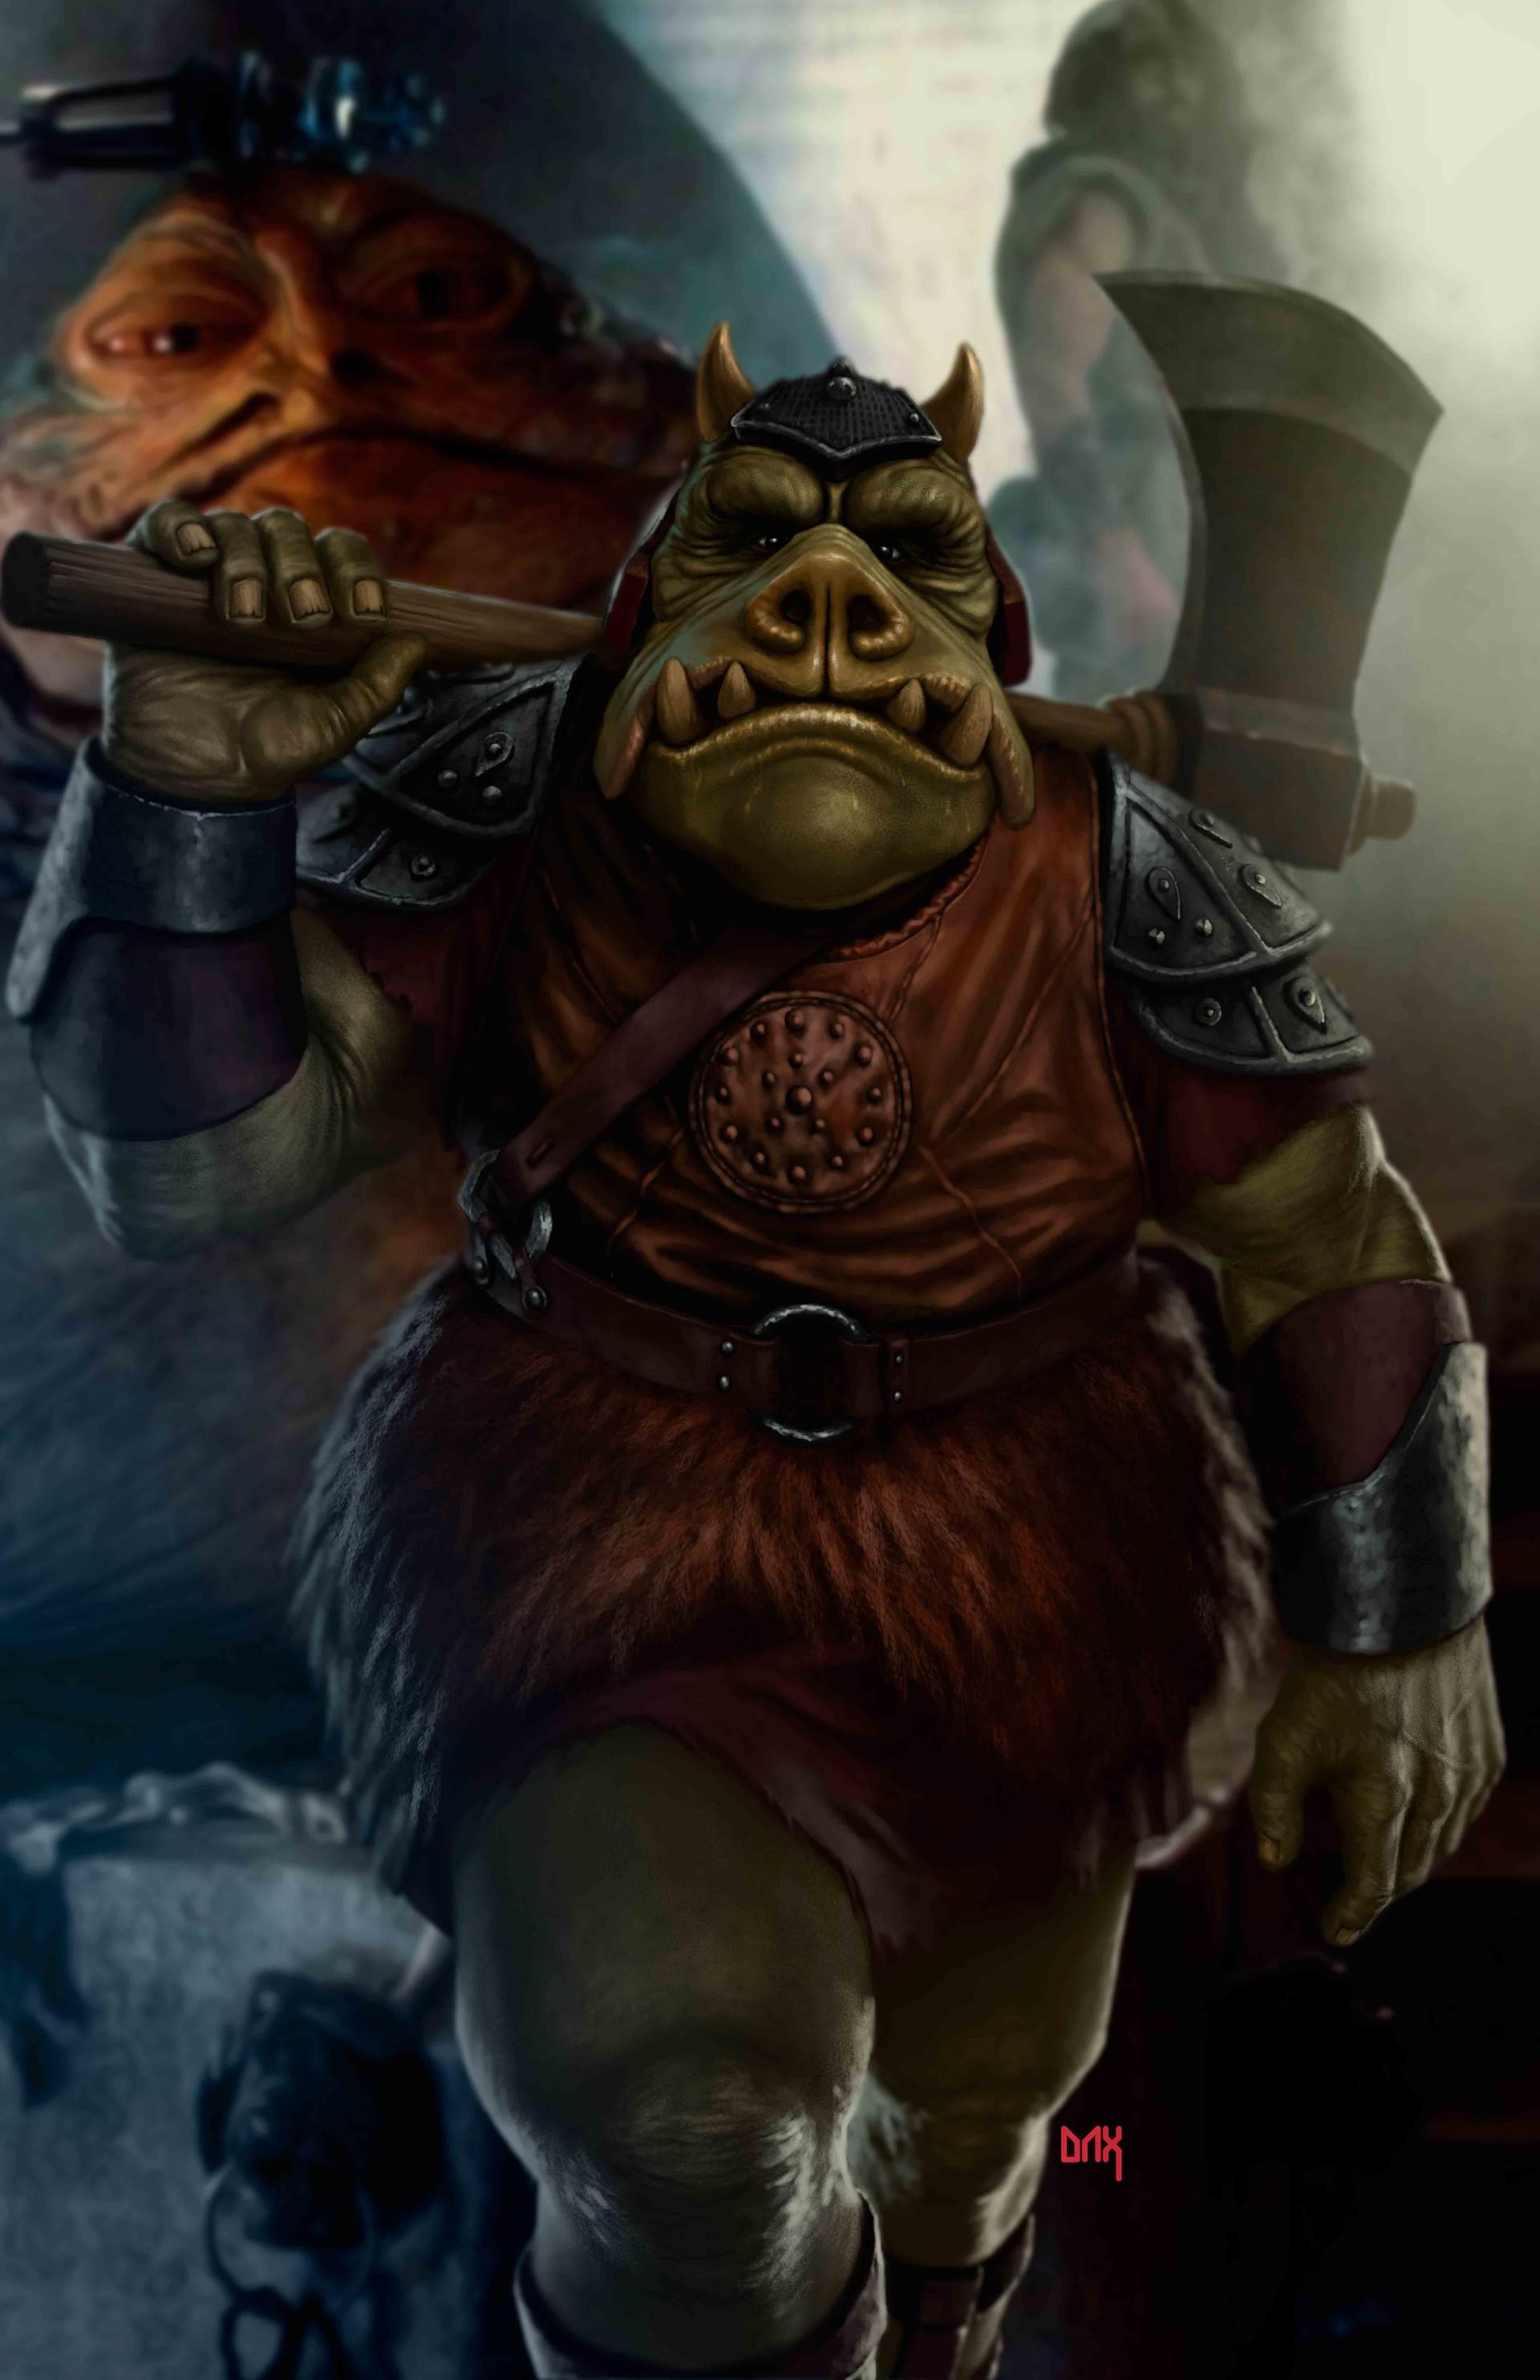 Stephen costantino interview gamorrean guard - Star wars gamorrean guard ...